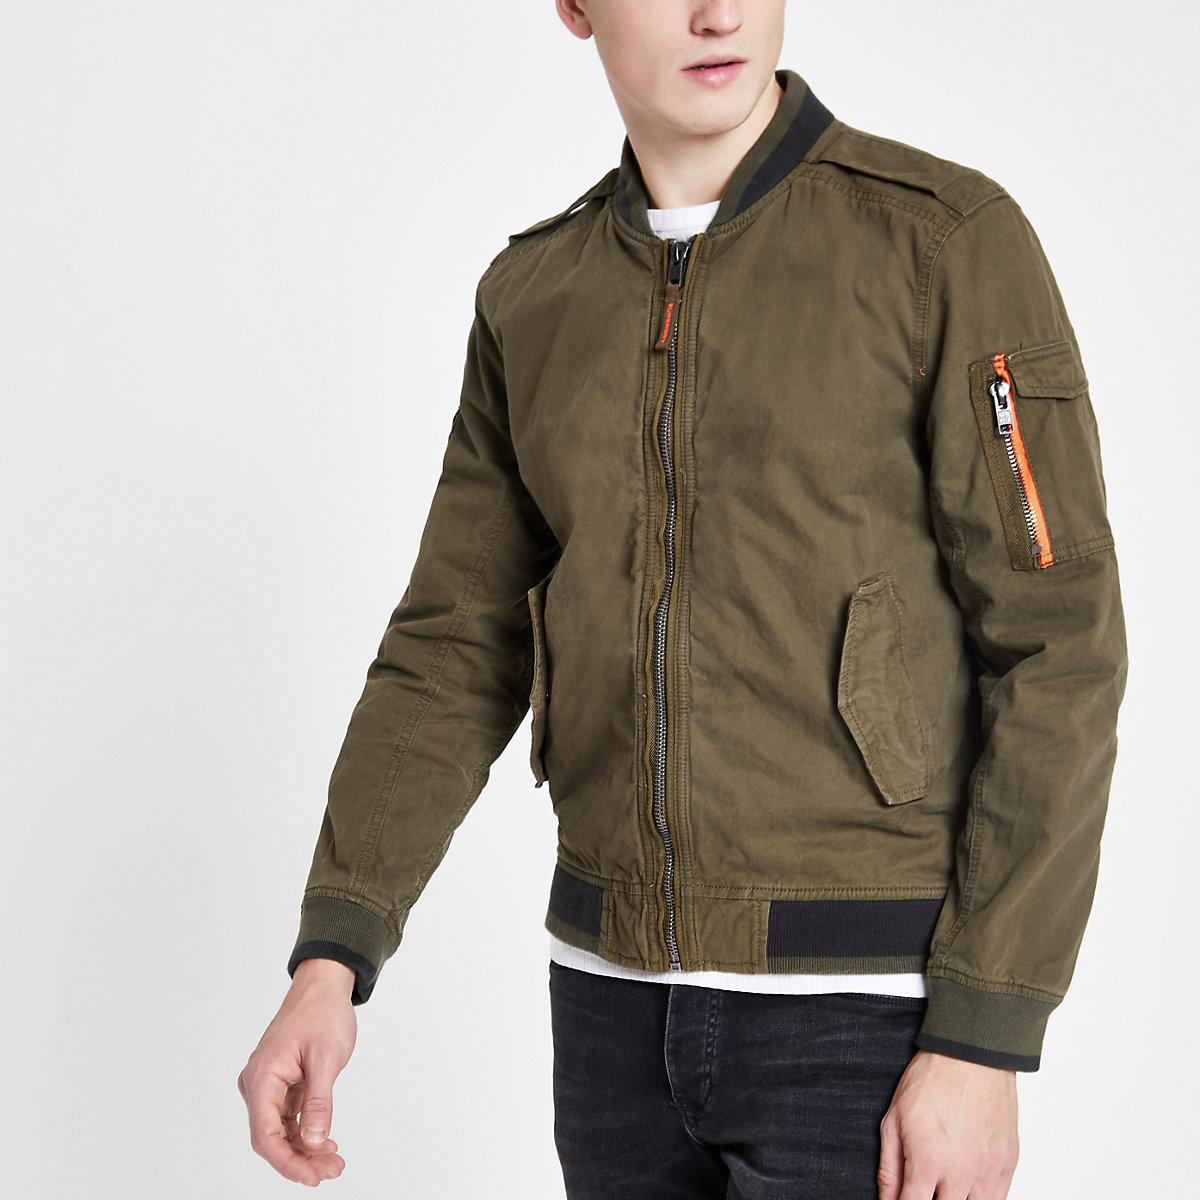 Superdry khaki bomber jacket